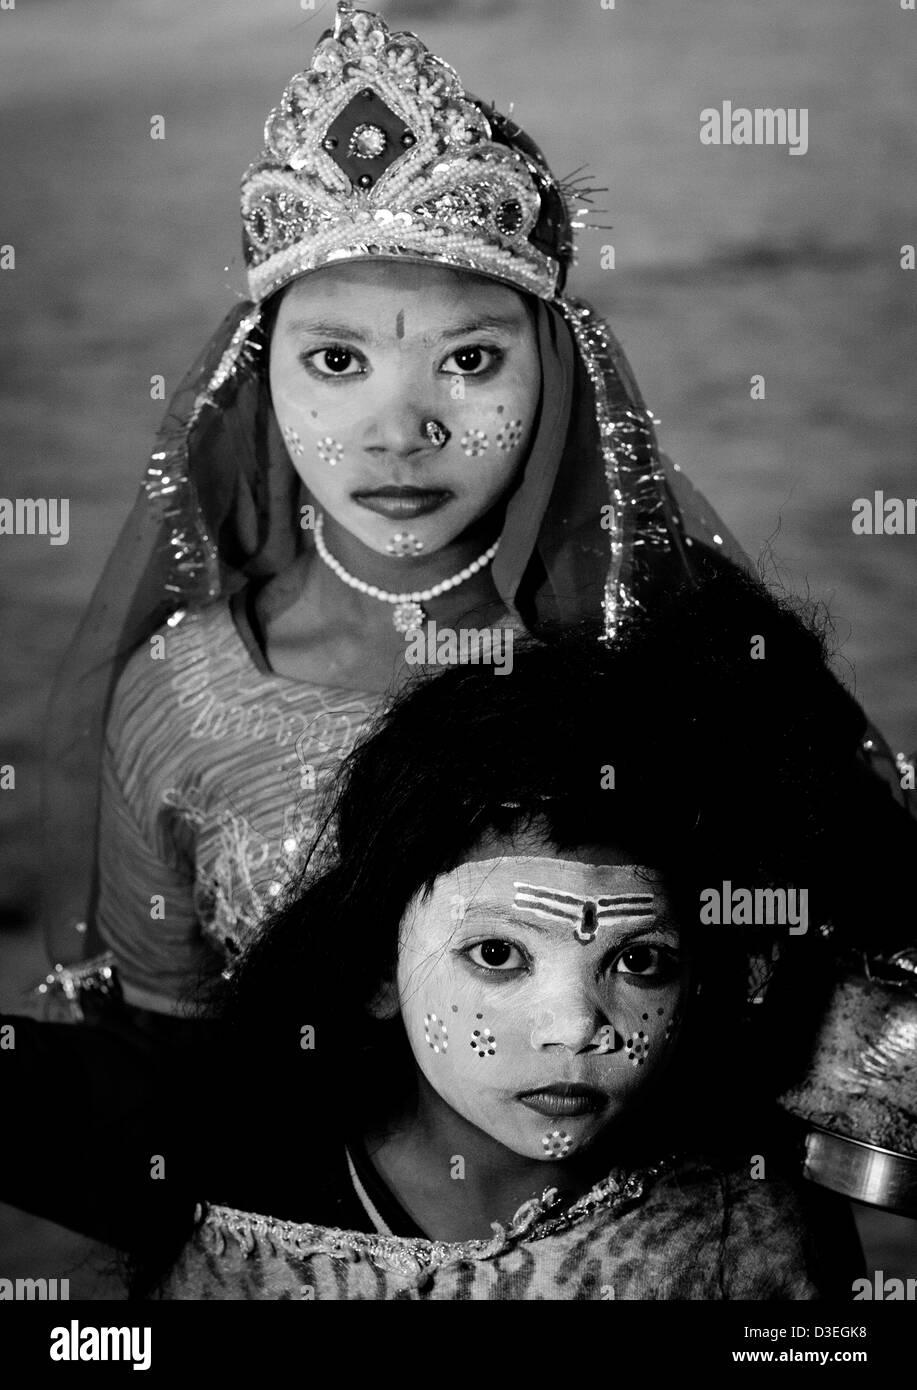 Young Girls With Shiva Make Up, Maha Kumbh Mela, Allahabad, India - Stock Image